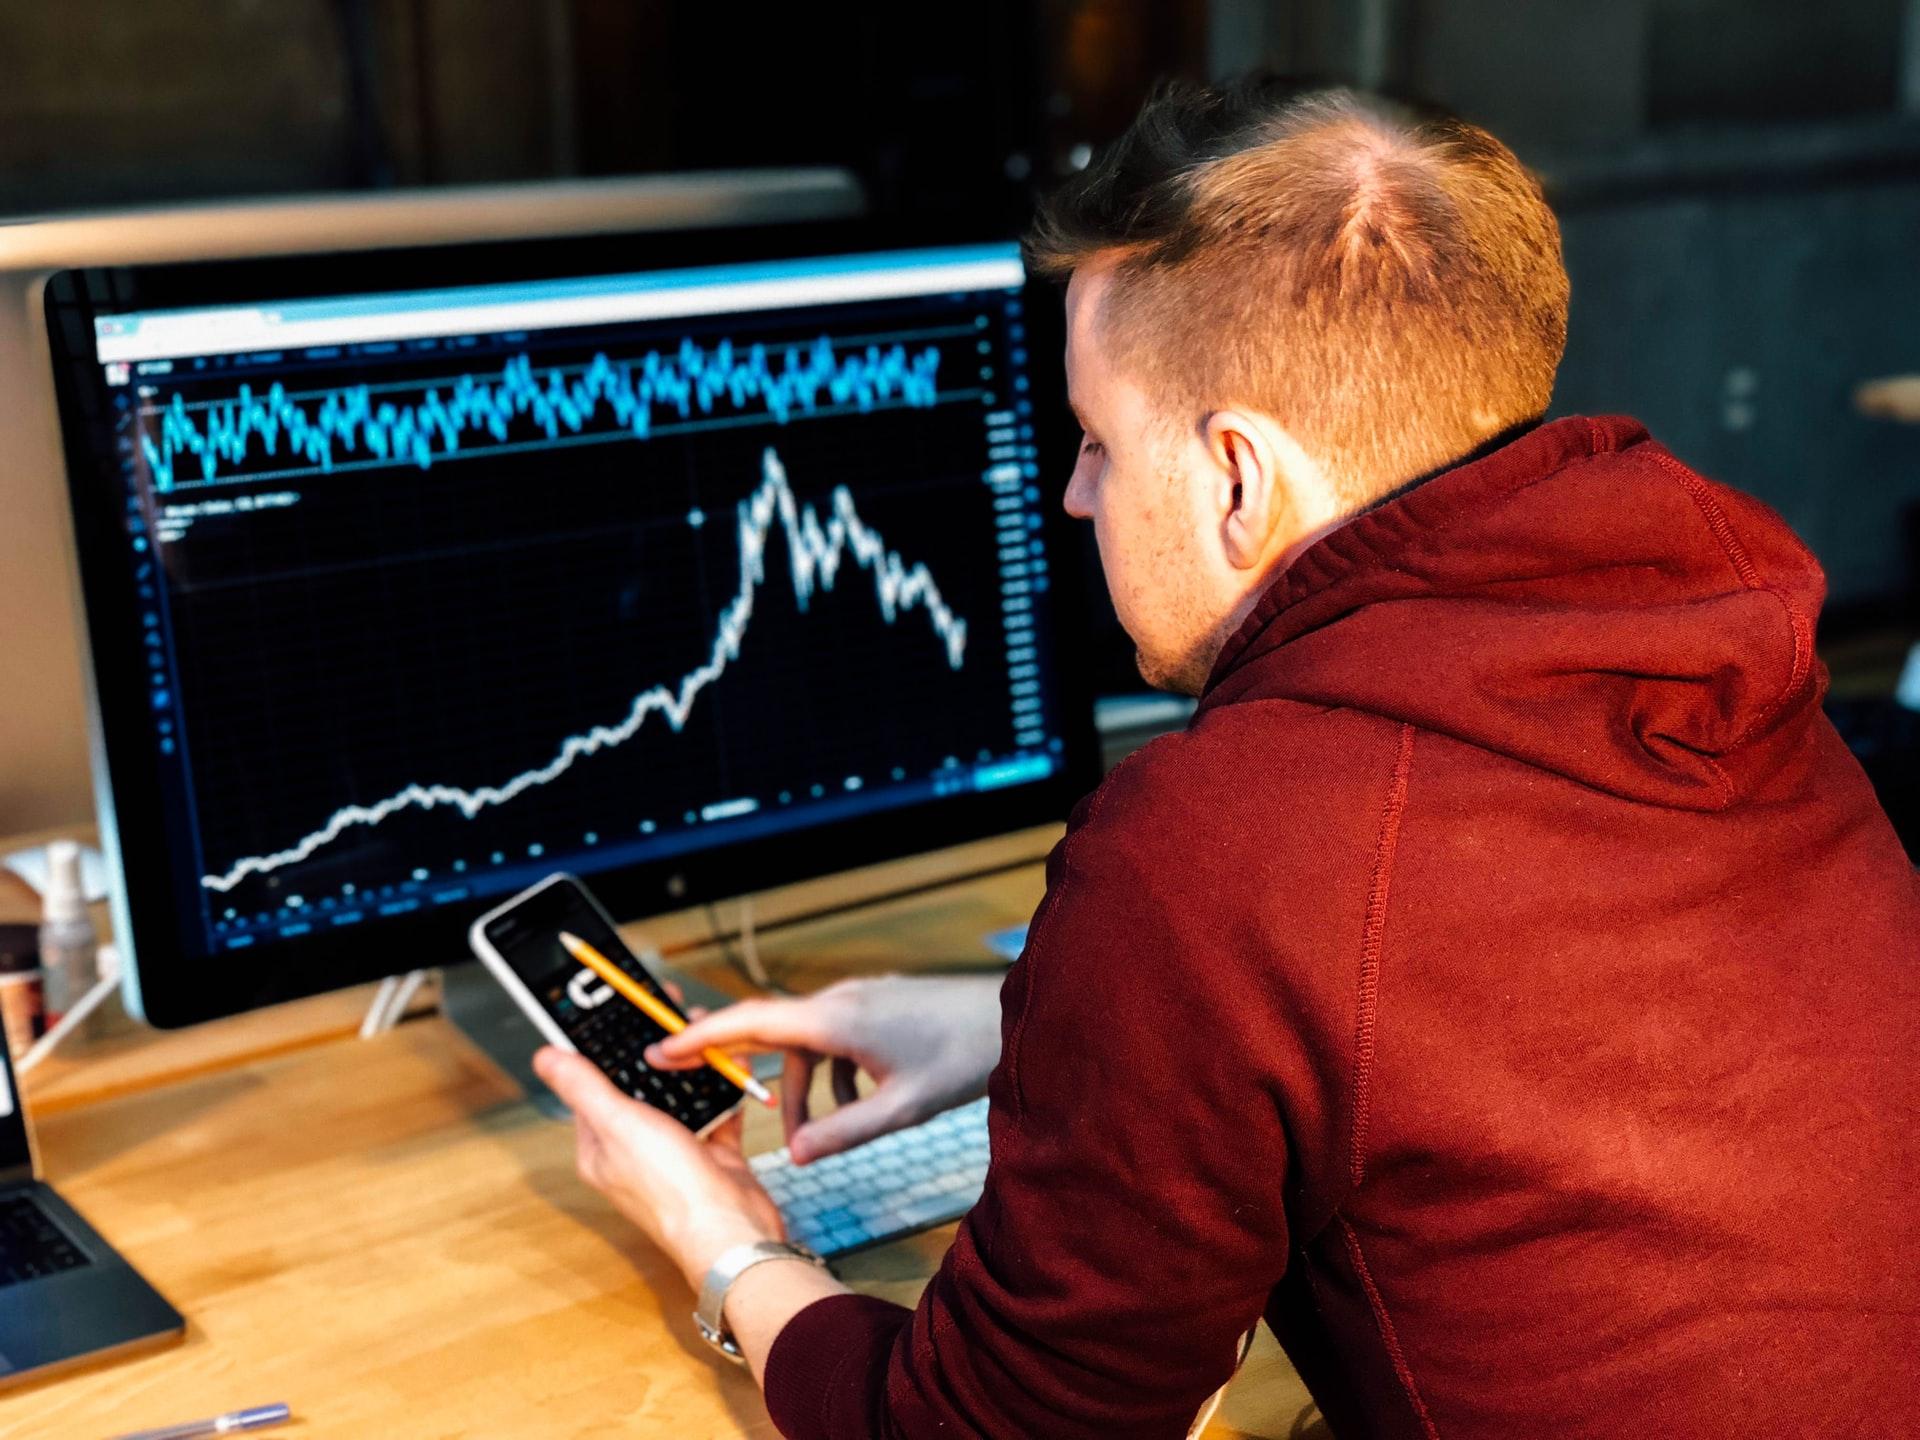 PrimaryBid scoops $50m to expand retail investor platform